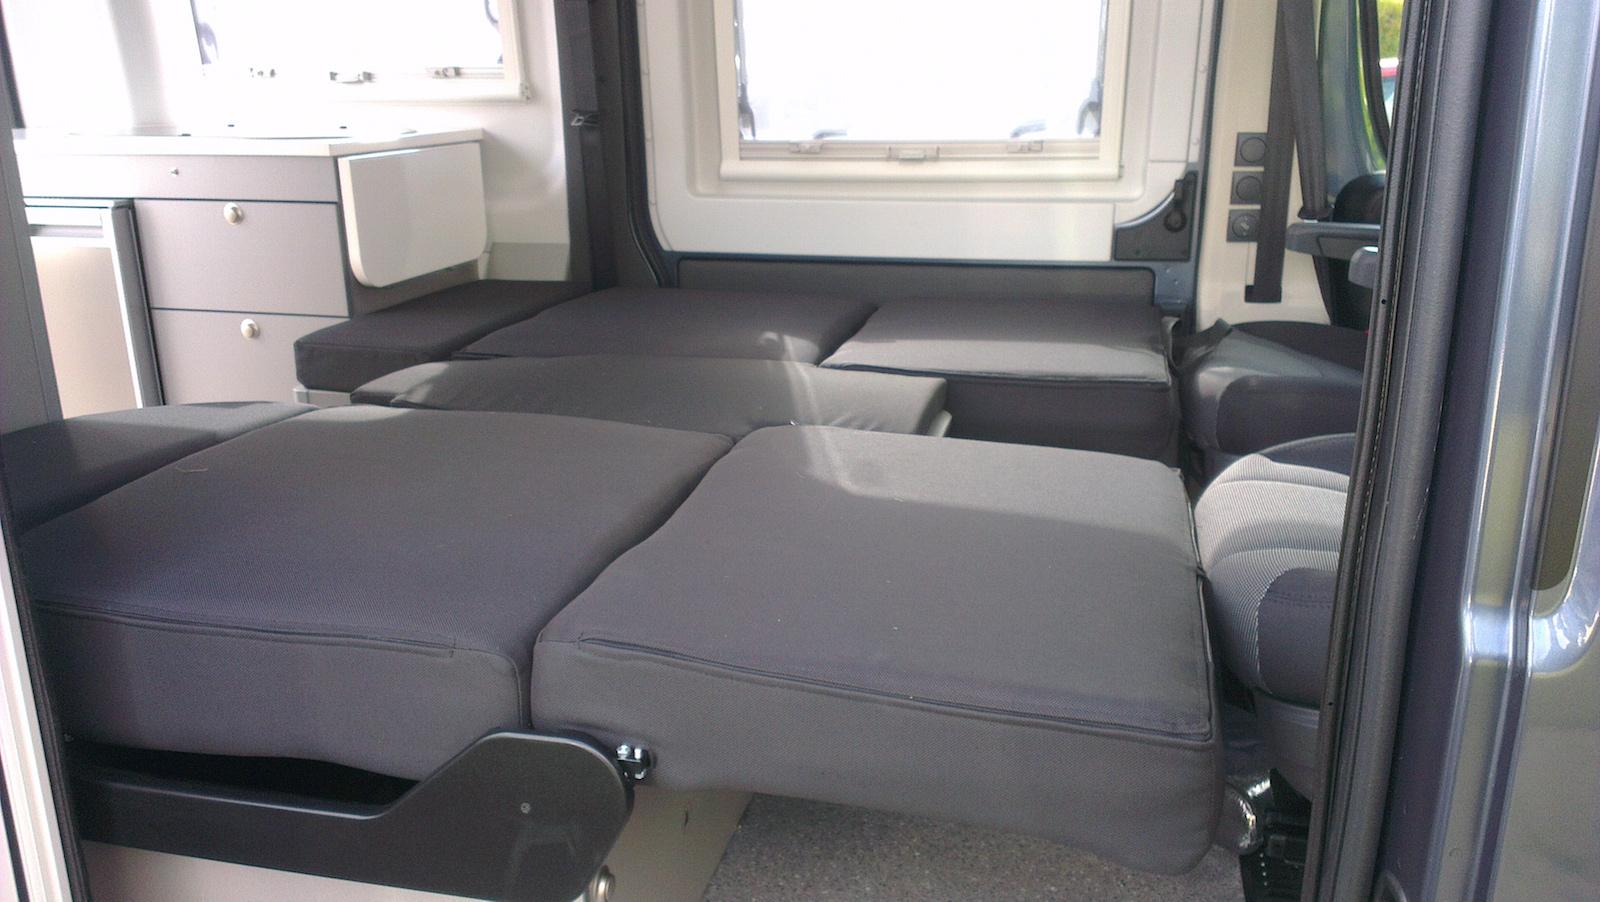 2 Berth Motorhome For Hire Adria Twin 500s Motorhome